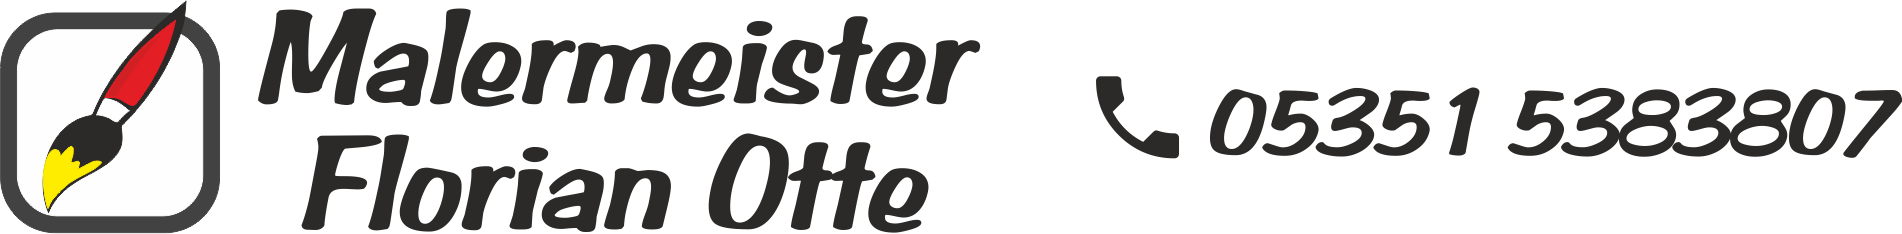 Malermeister Otte